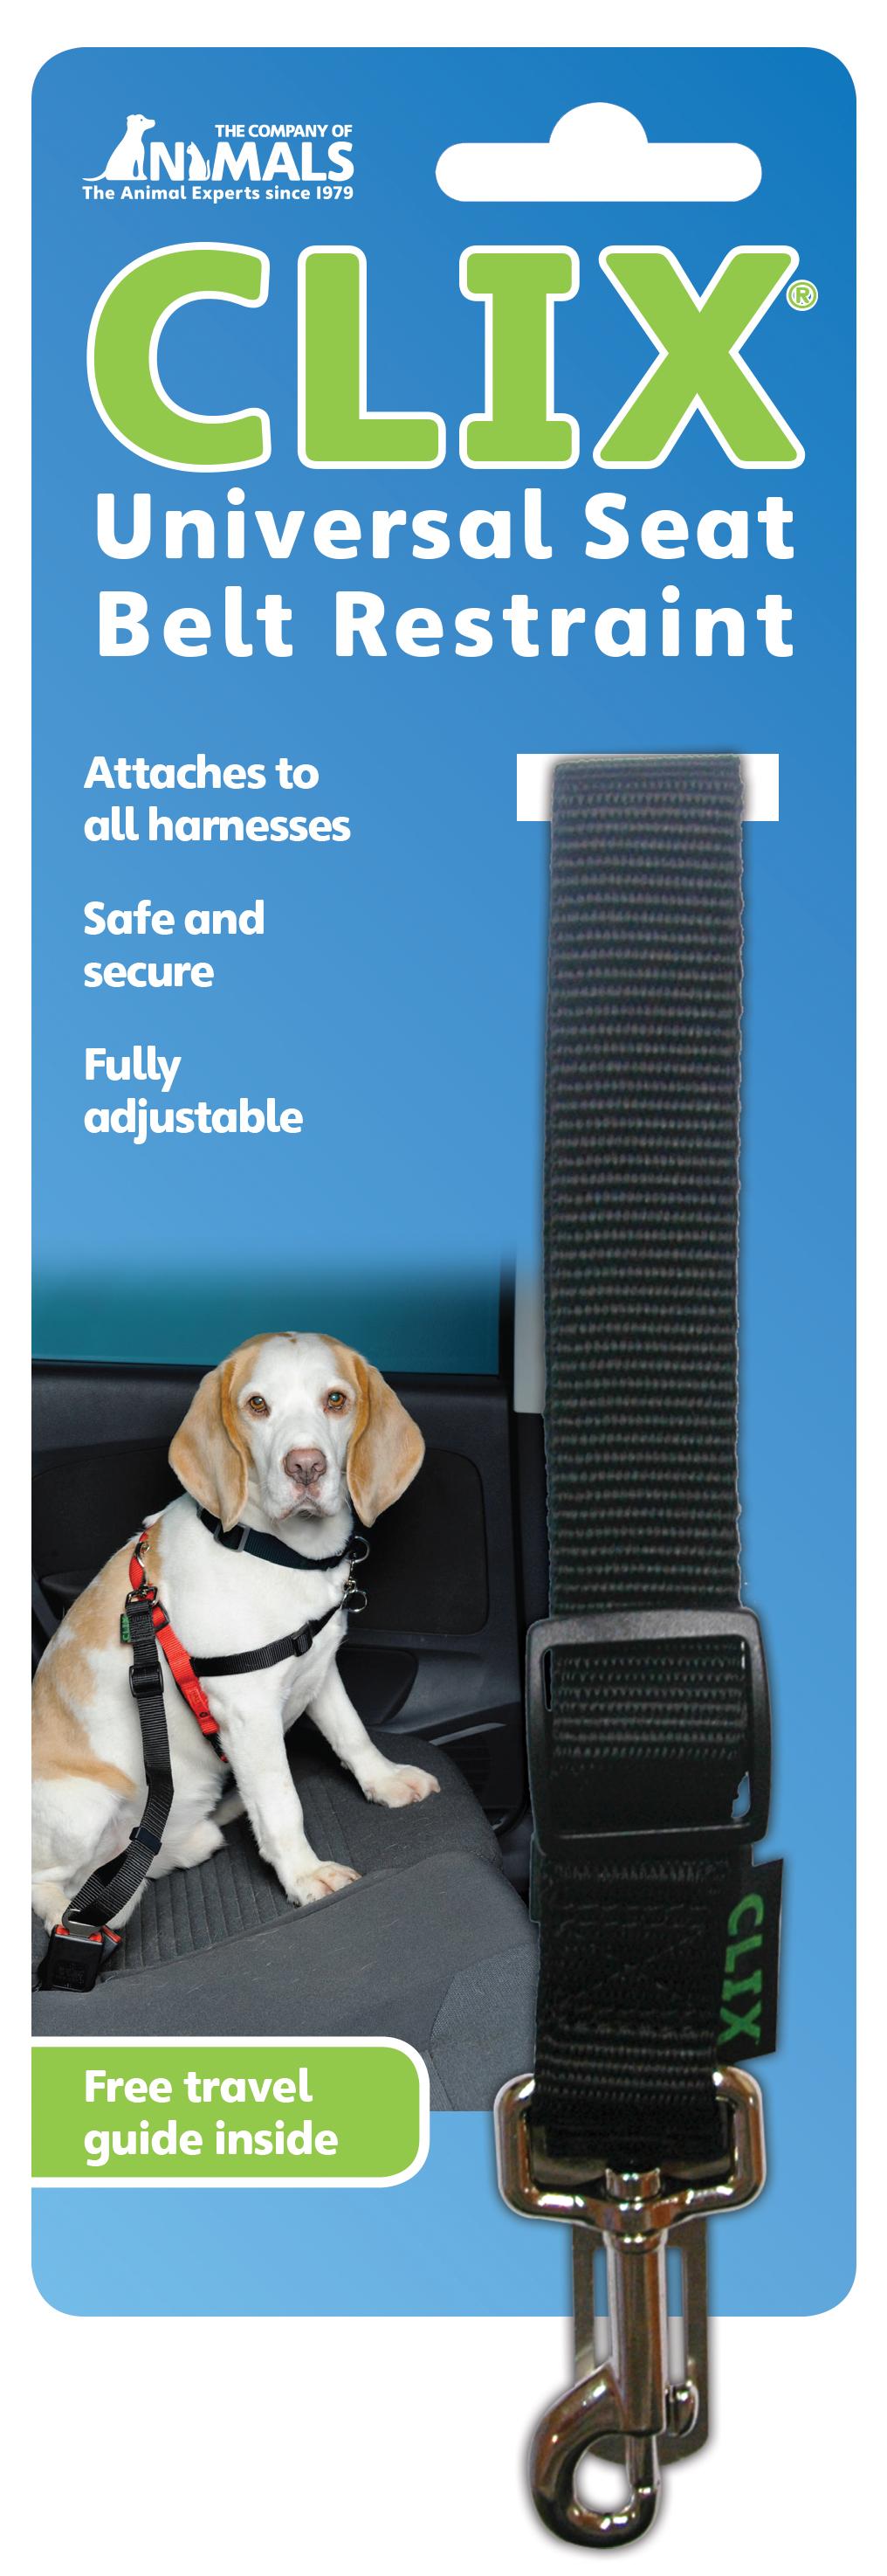 Clix Universal Seat Belt Restraint Rar on Dog Car Seat Belt Restraint